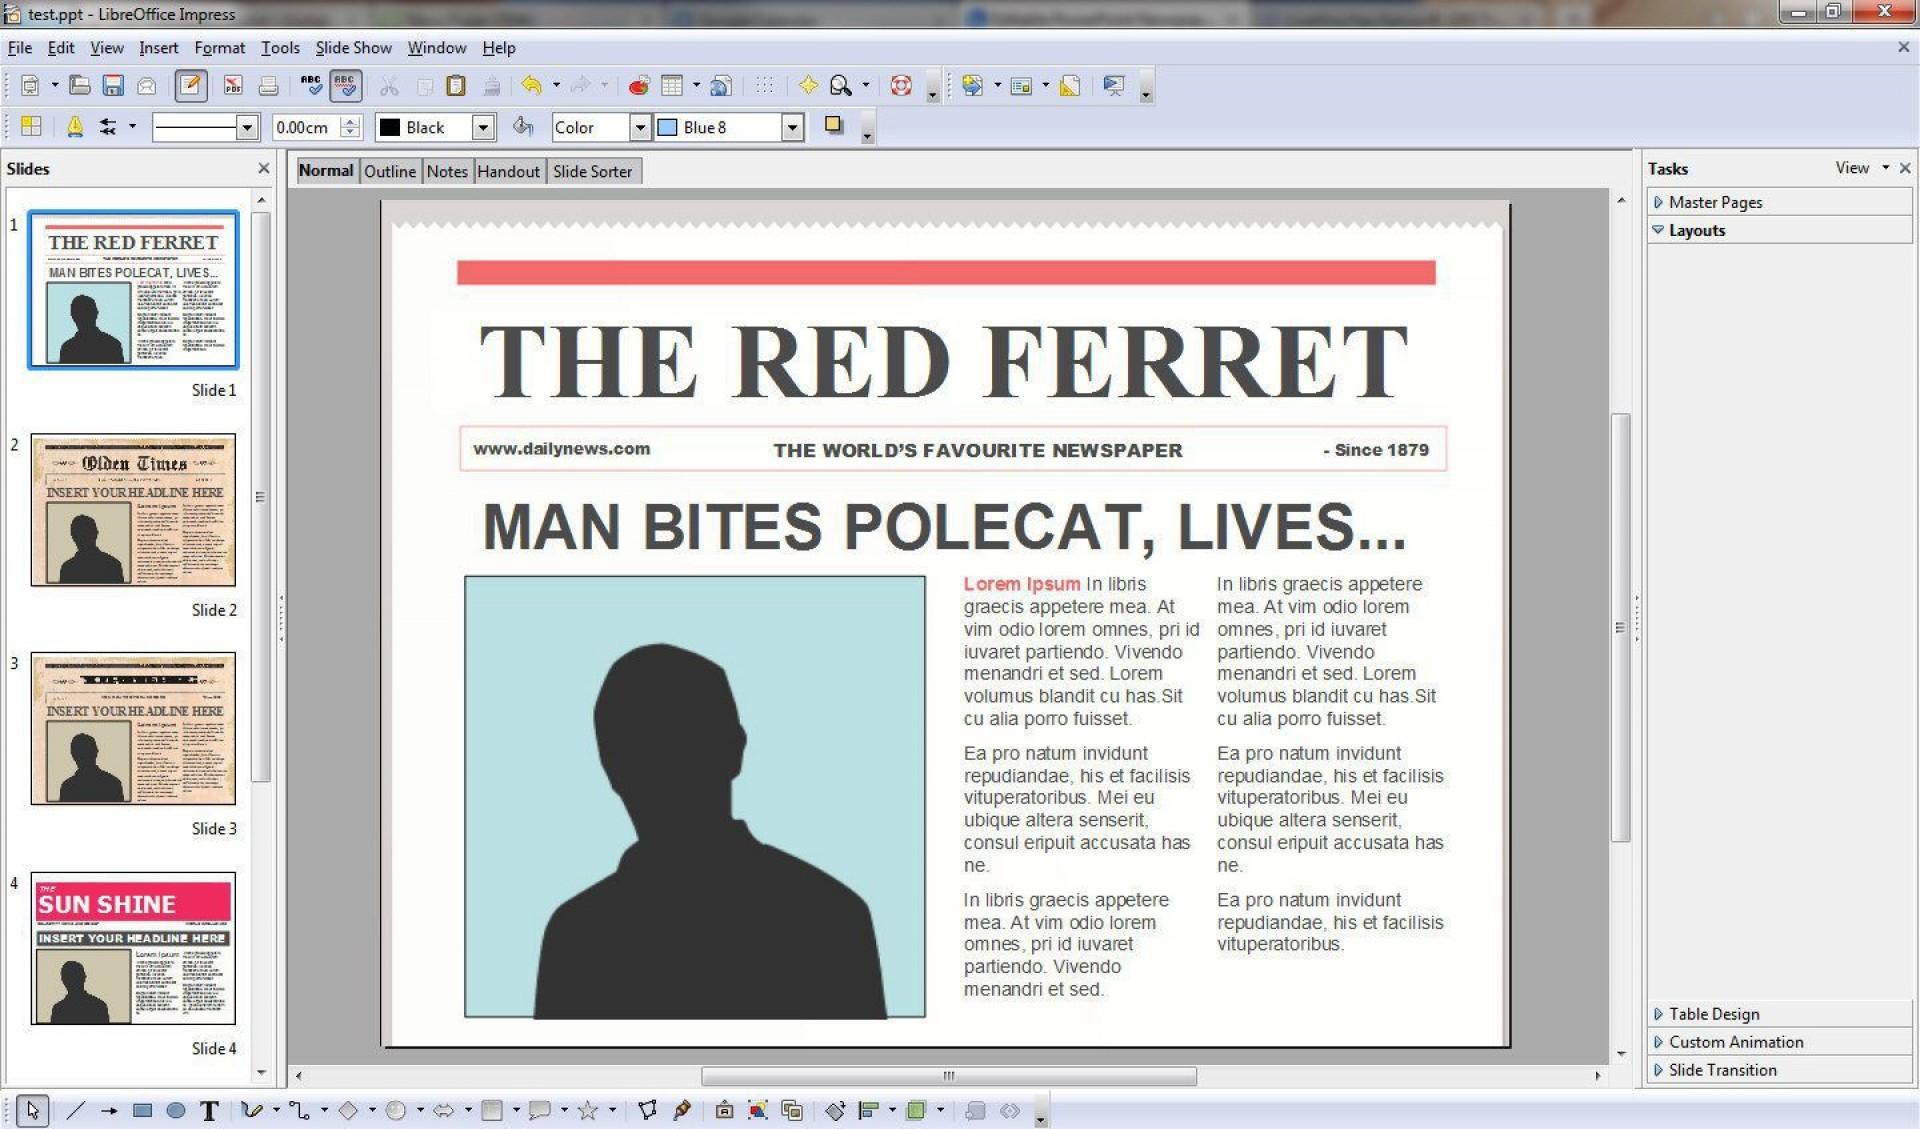 010 Stirring Word Newsletter Template Free Download Sample  Document M 2007 Design1920